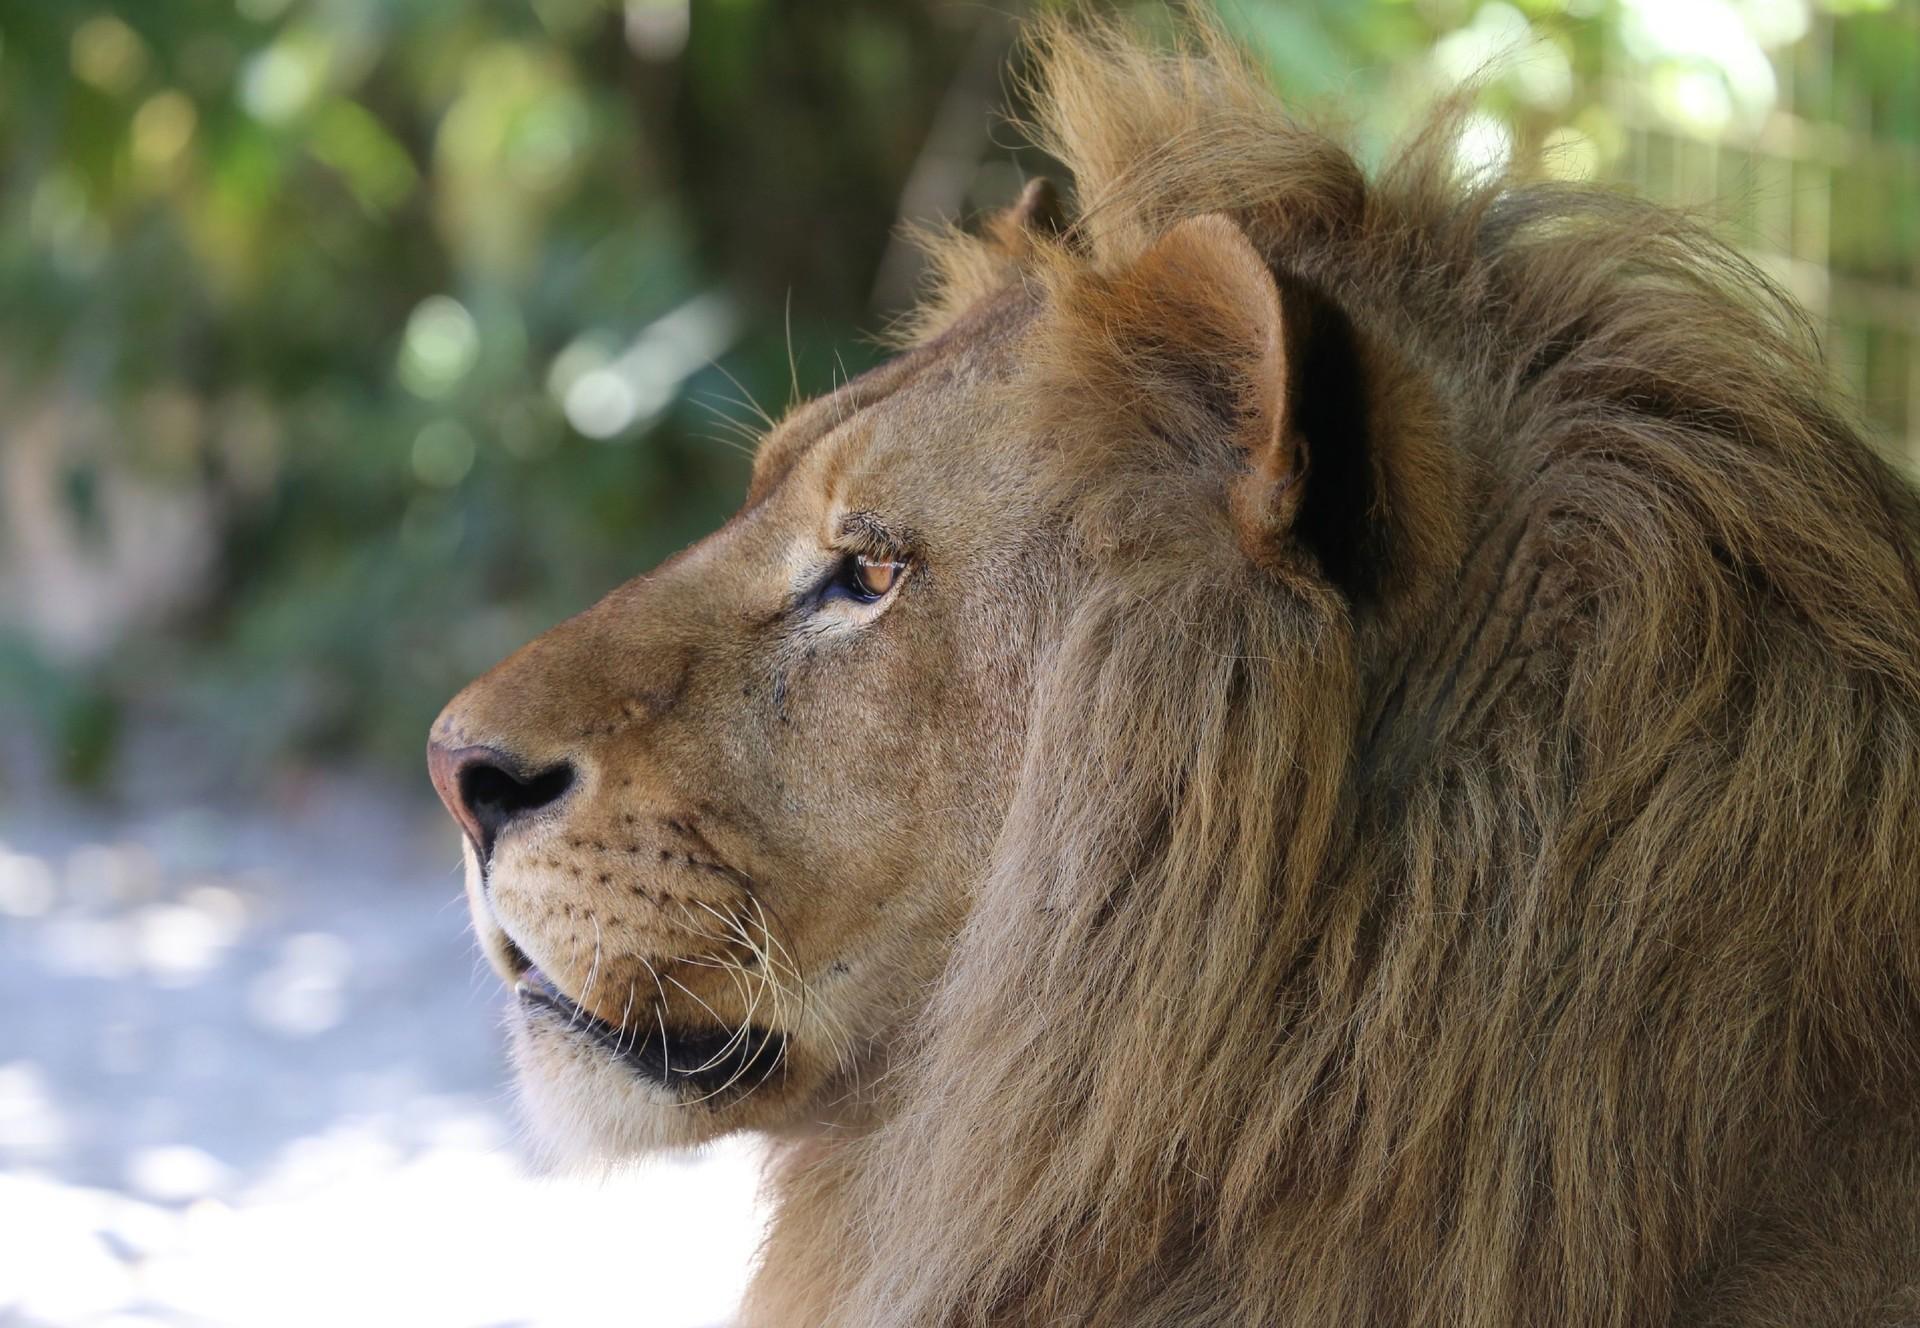 lion-blurry-background